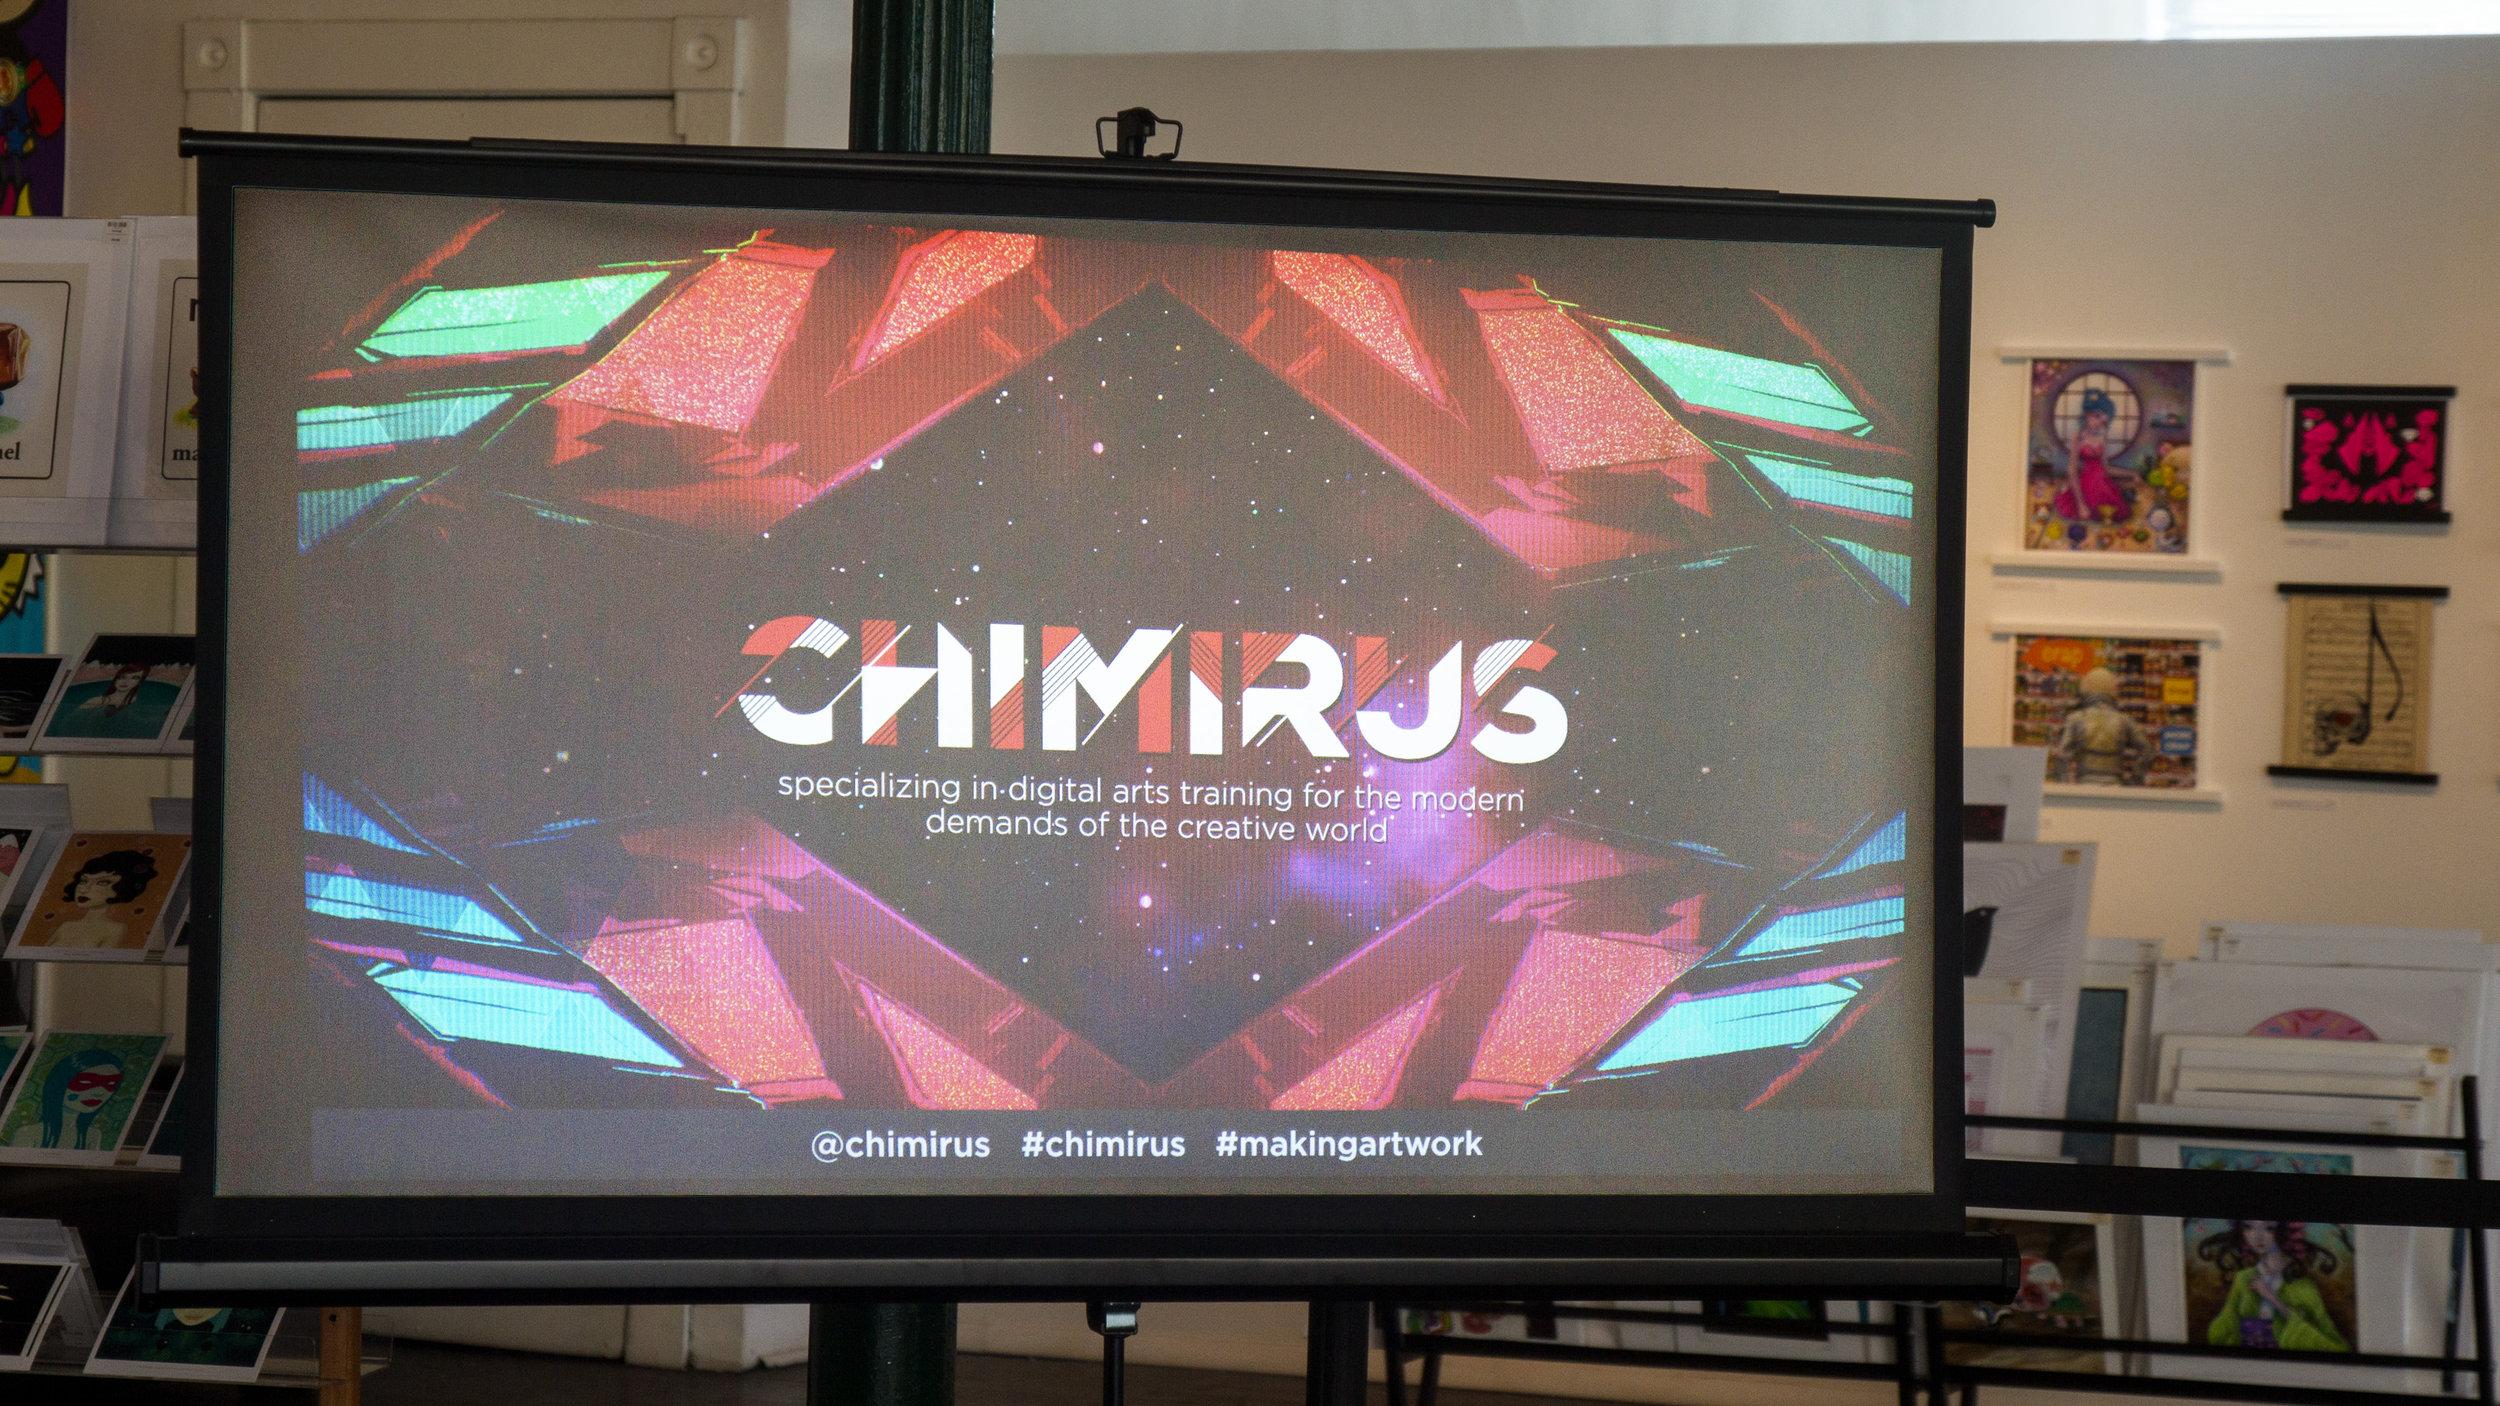 CW_Chimirus_091617-4.jpg